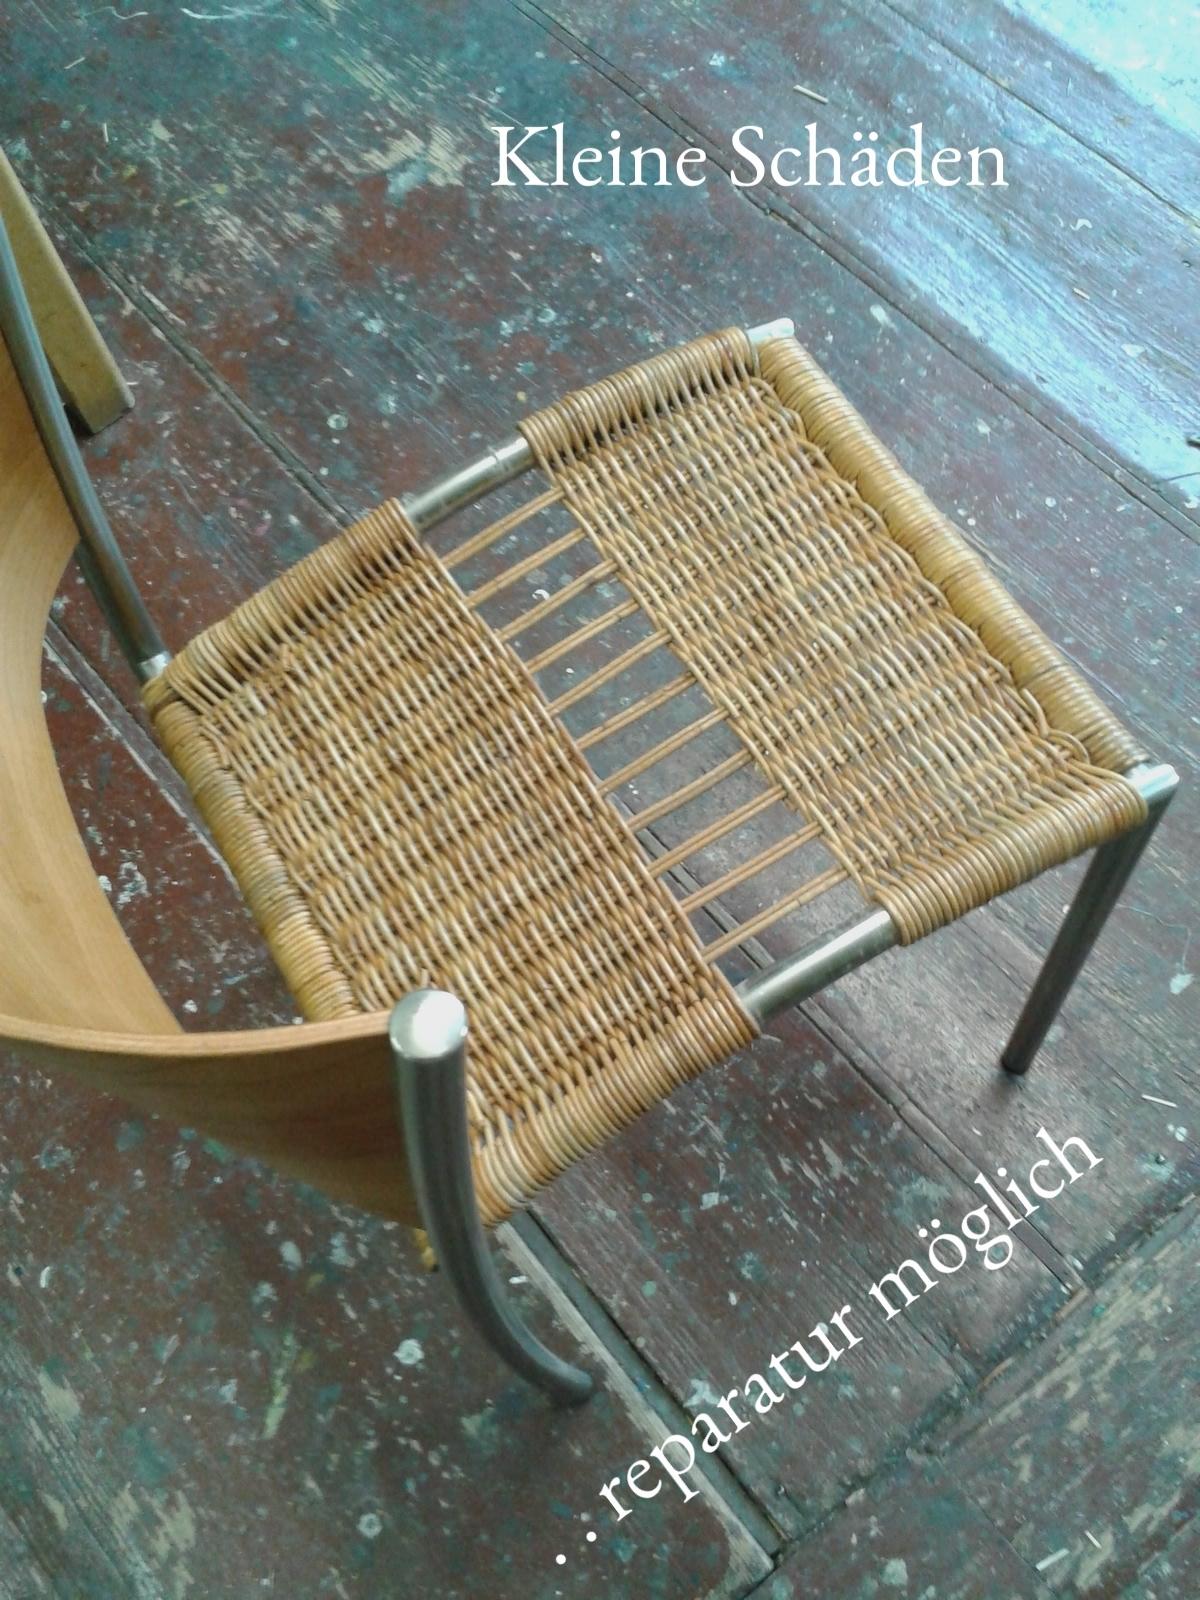 Geflochtene Stuhle Reparieren Stuhlflechterei